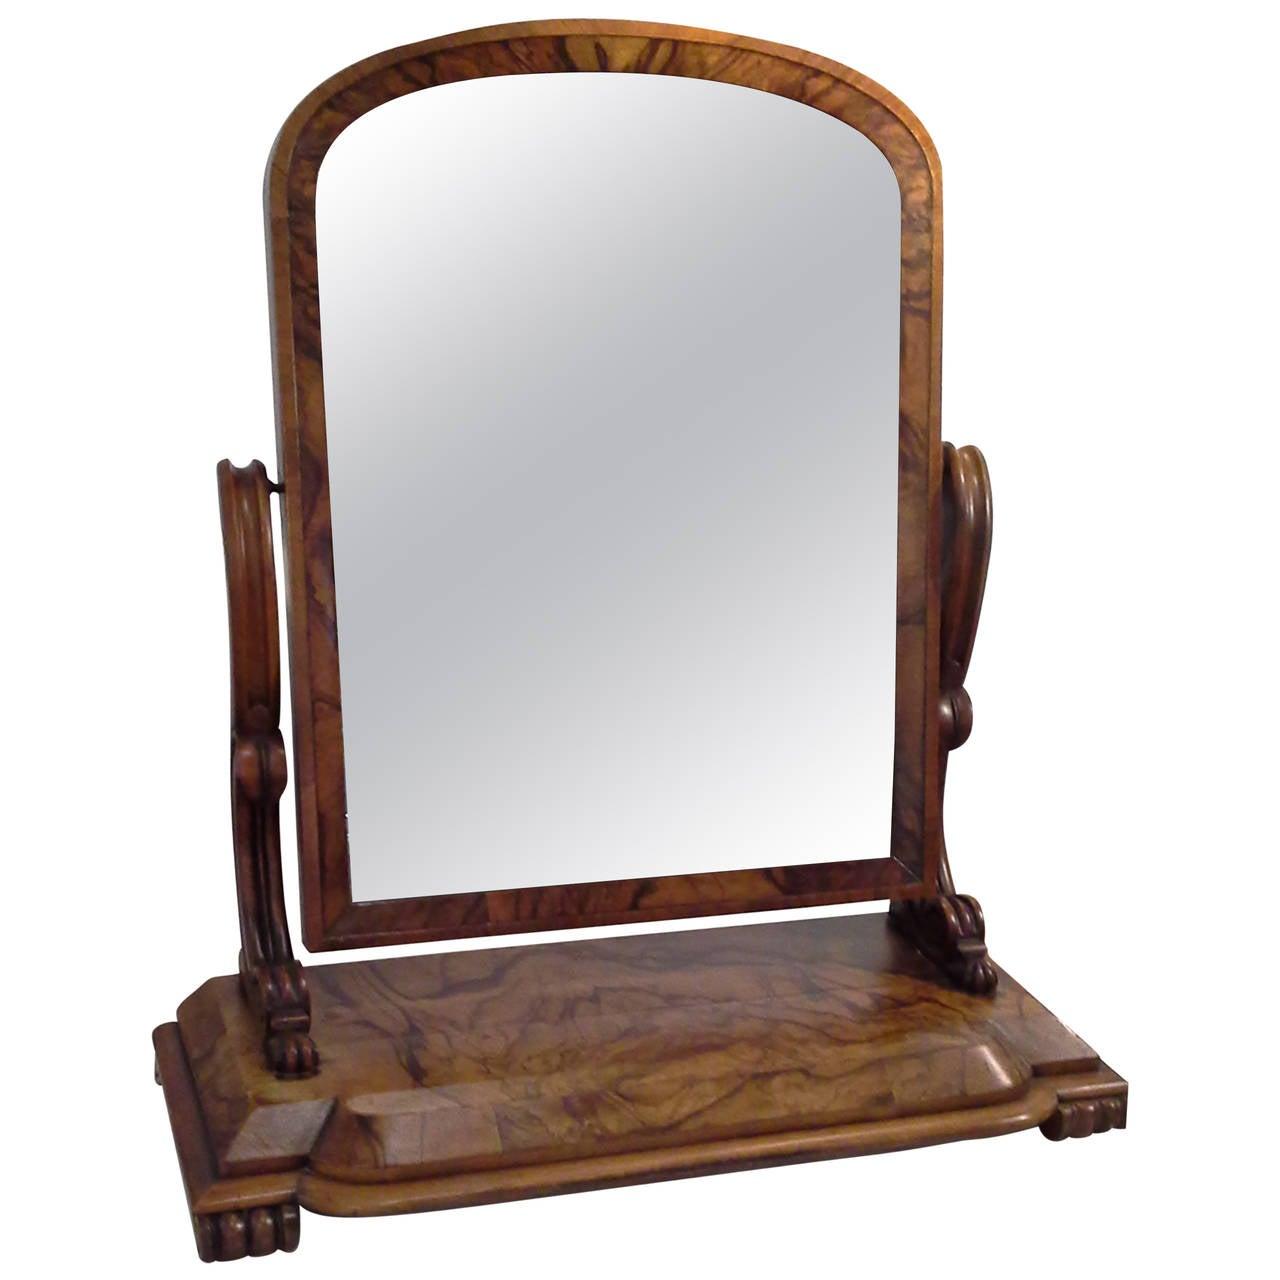 Burled Walnut Gentleman's Dressing Mirror on a Scrolled Bun Foot